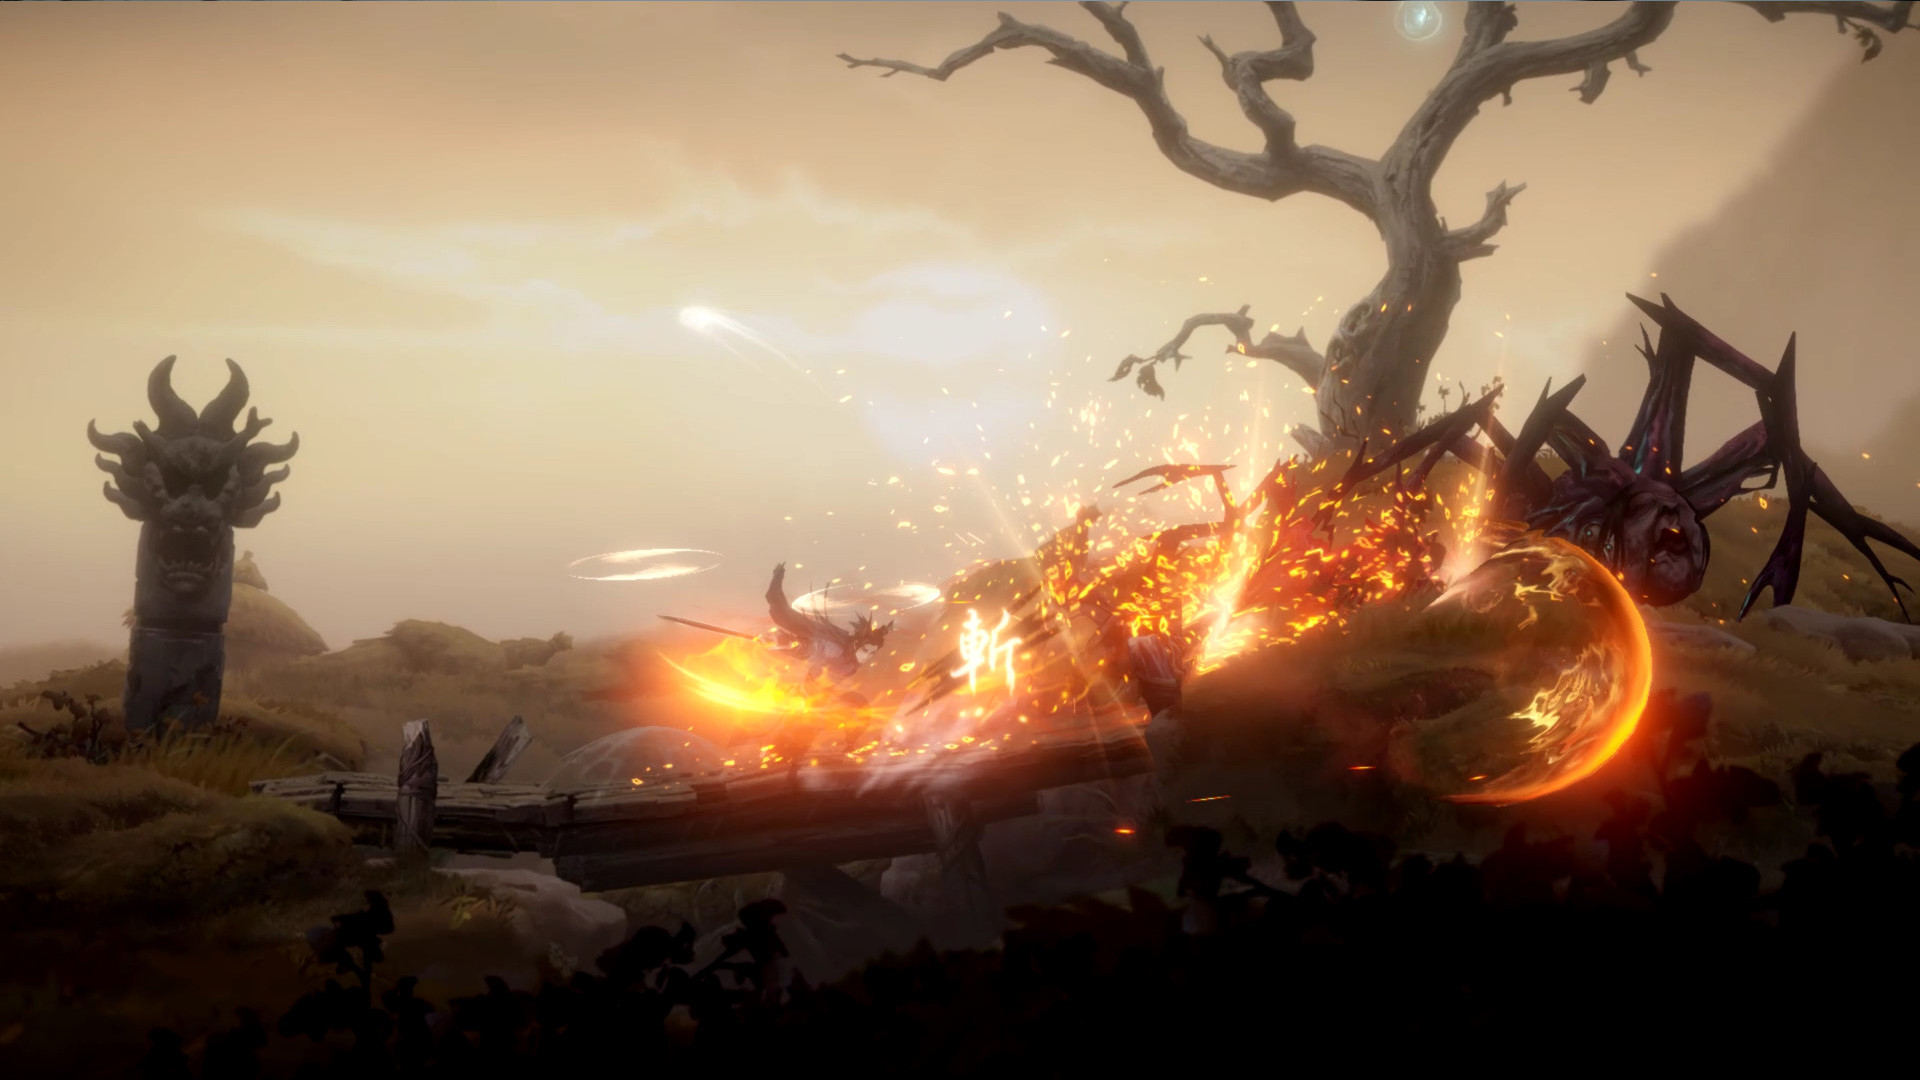 eastern-exorcist-pc-screenshot-1